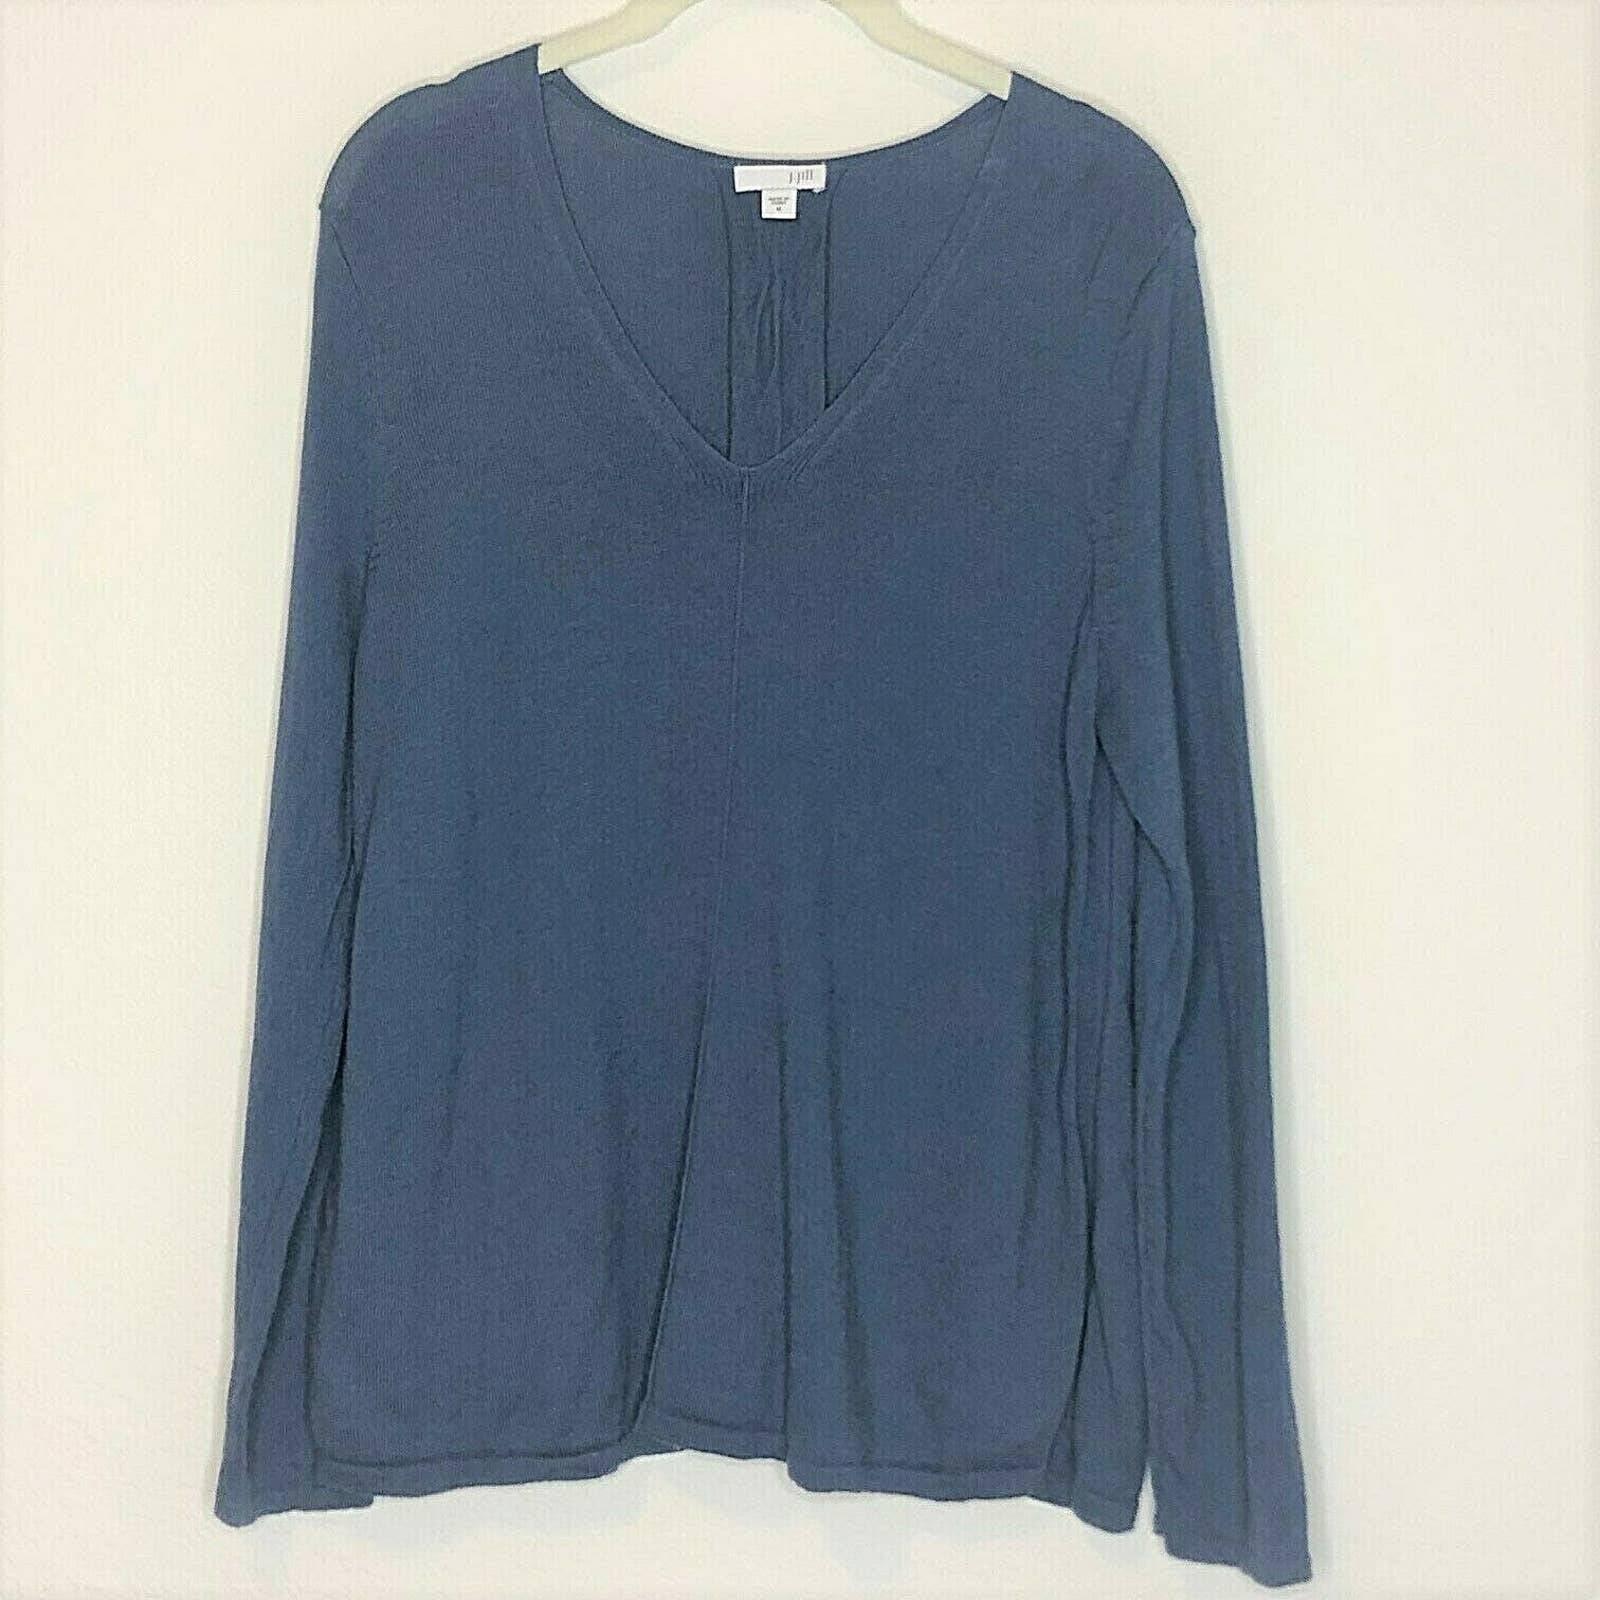 J Jill Sweater V-Neck Blue Cotton Blend